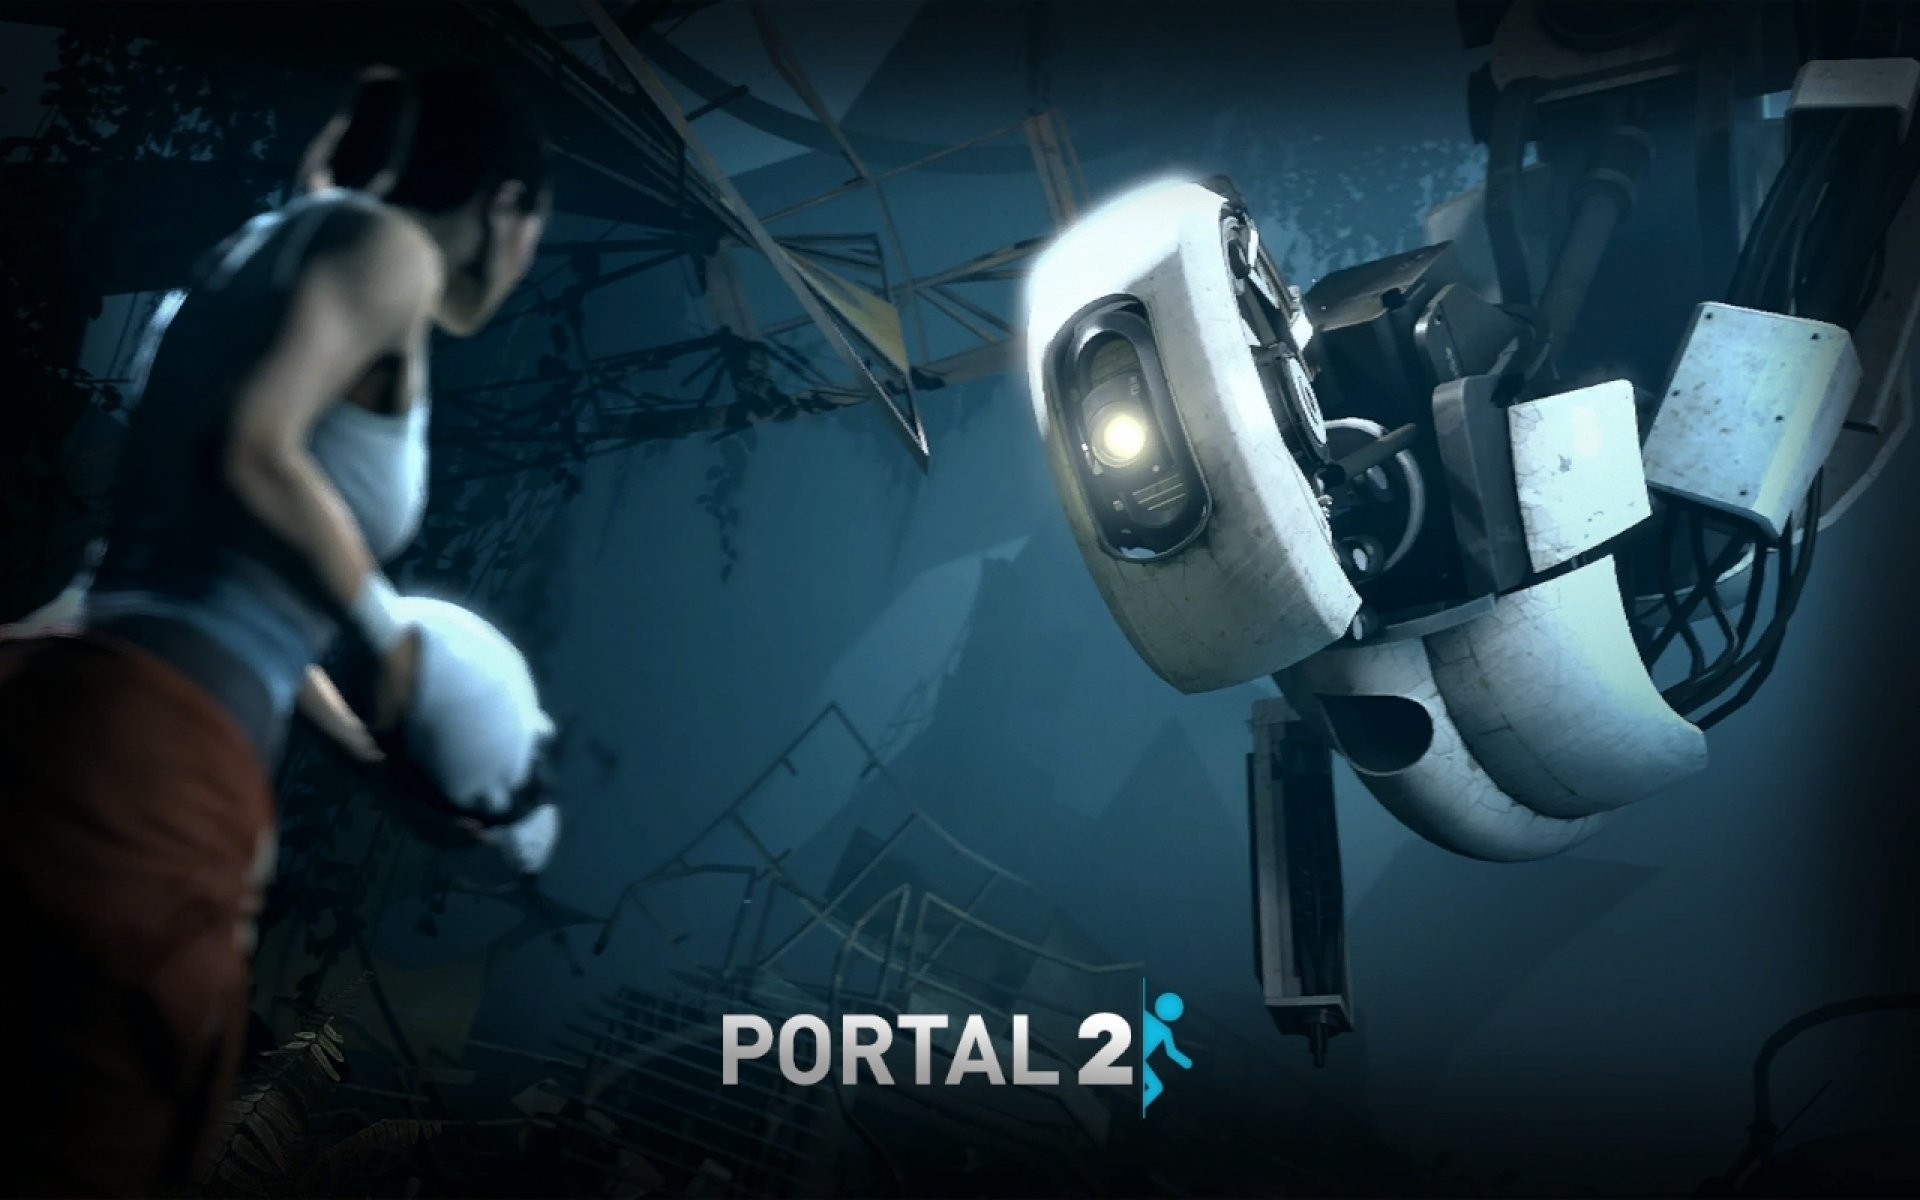 Portal 2, ID: NJM87, Barb Brode